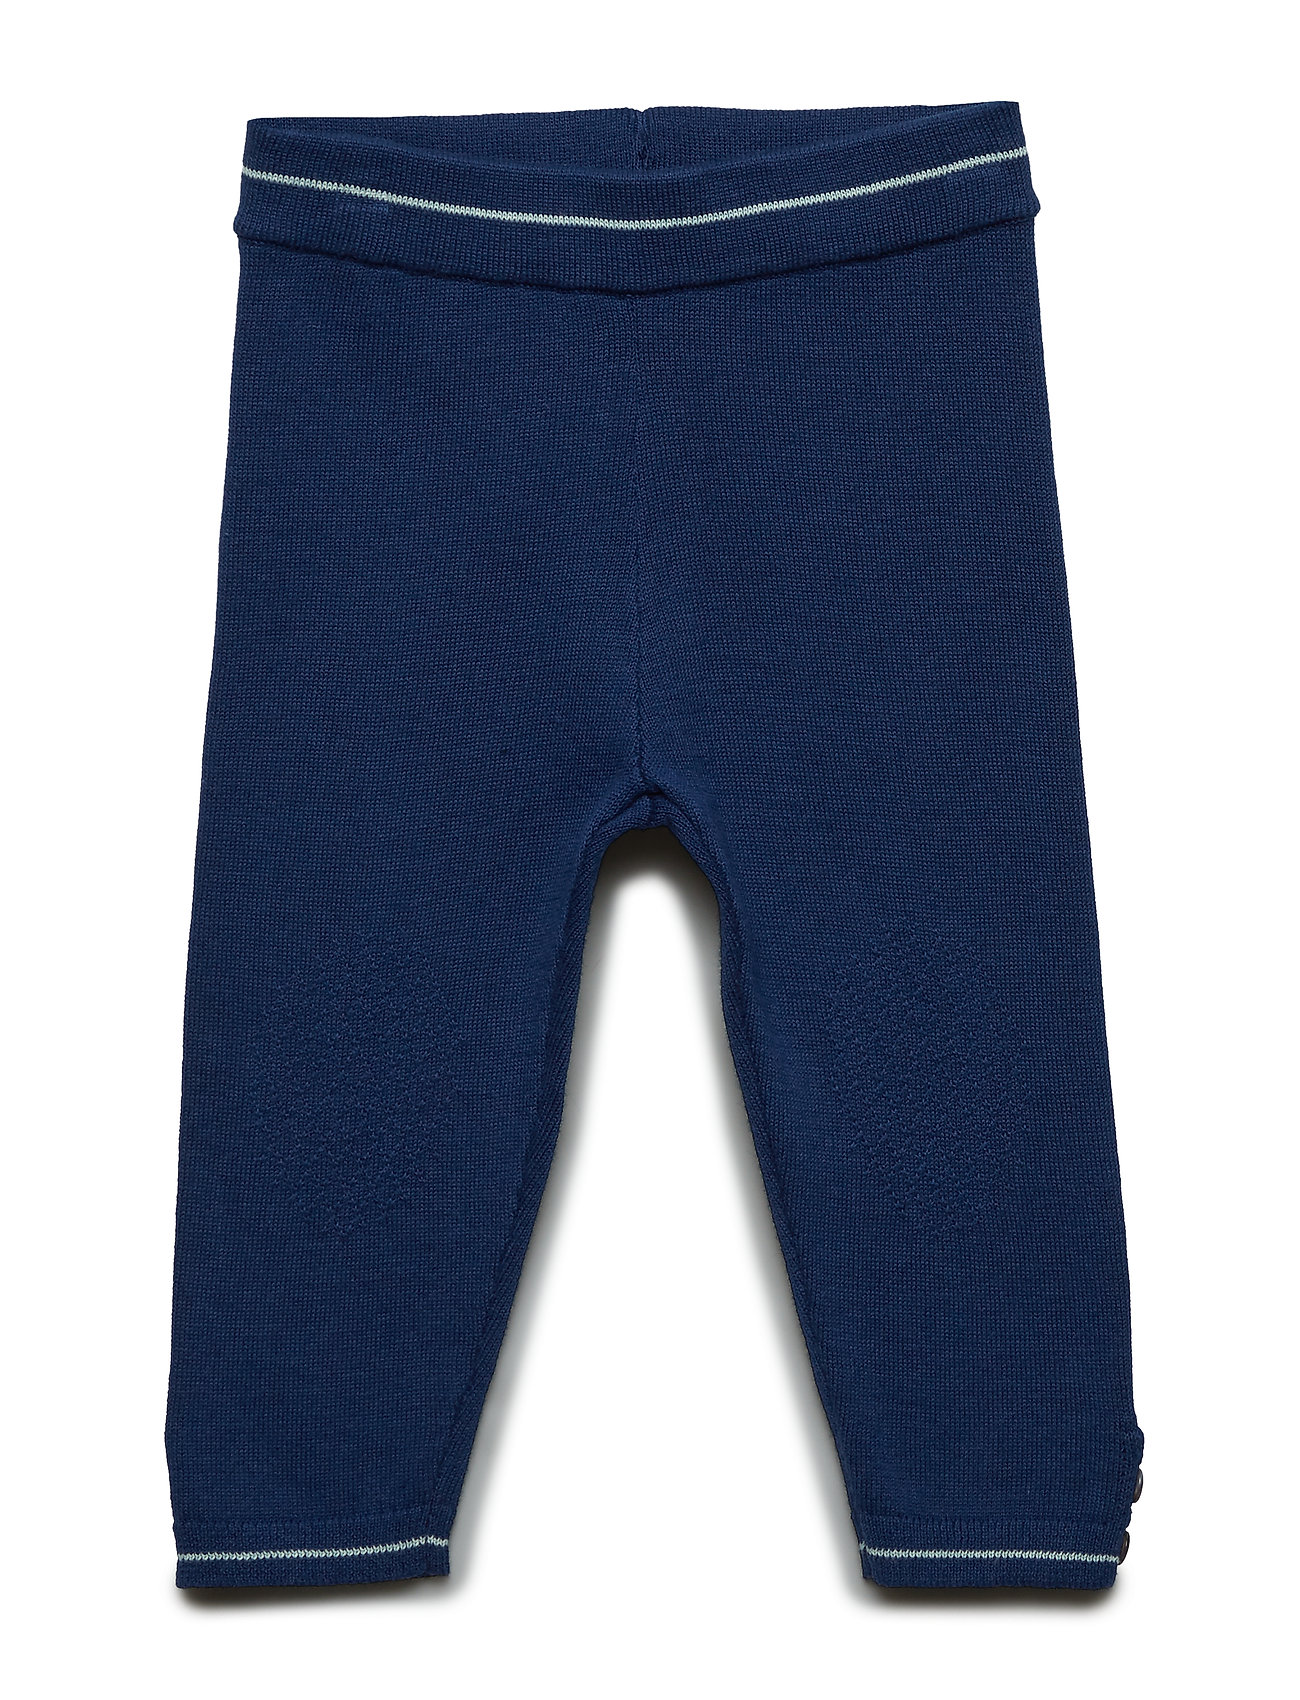 Image of Trousers Bukser Blå NOA NOA MINIATURE (3138616103)